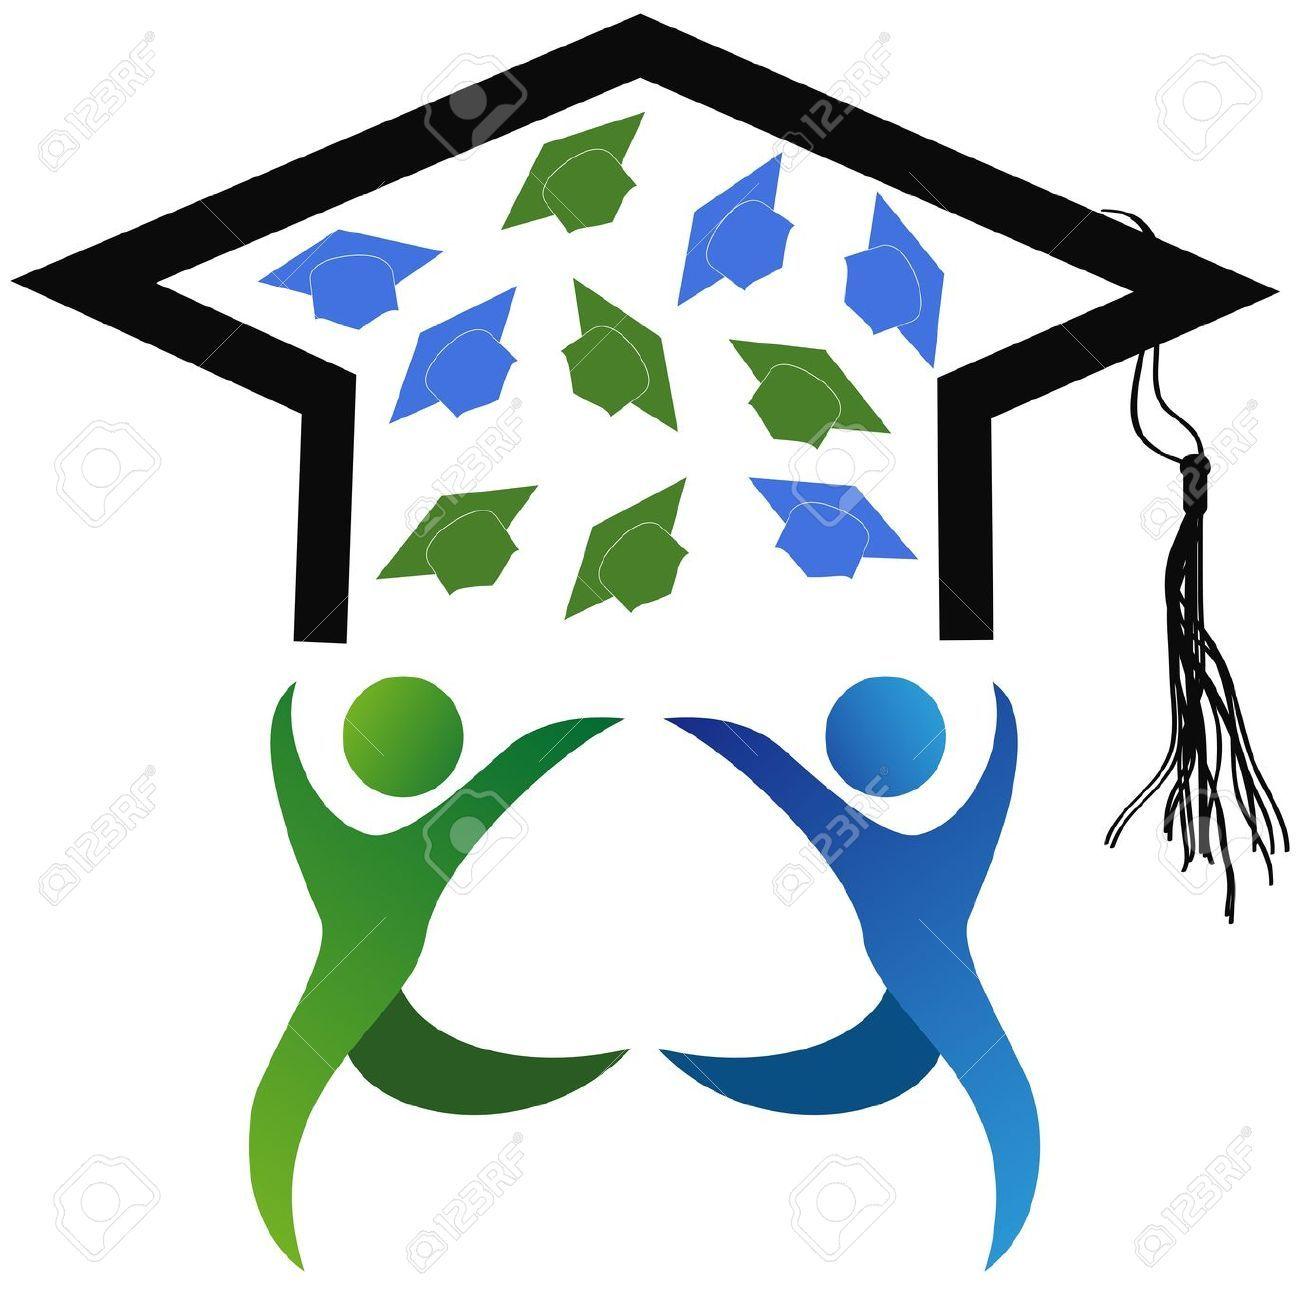 Student success clipart 3 » Clipart Portal.